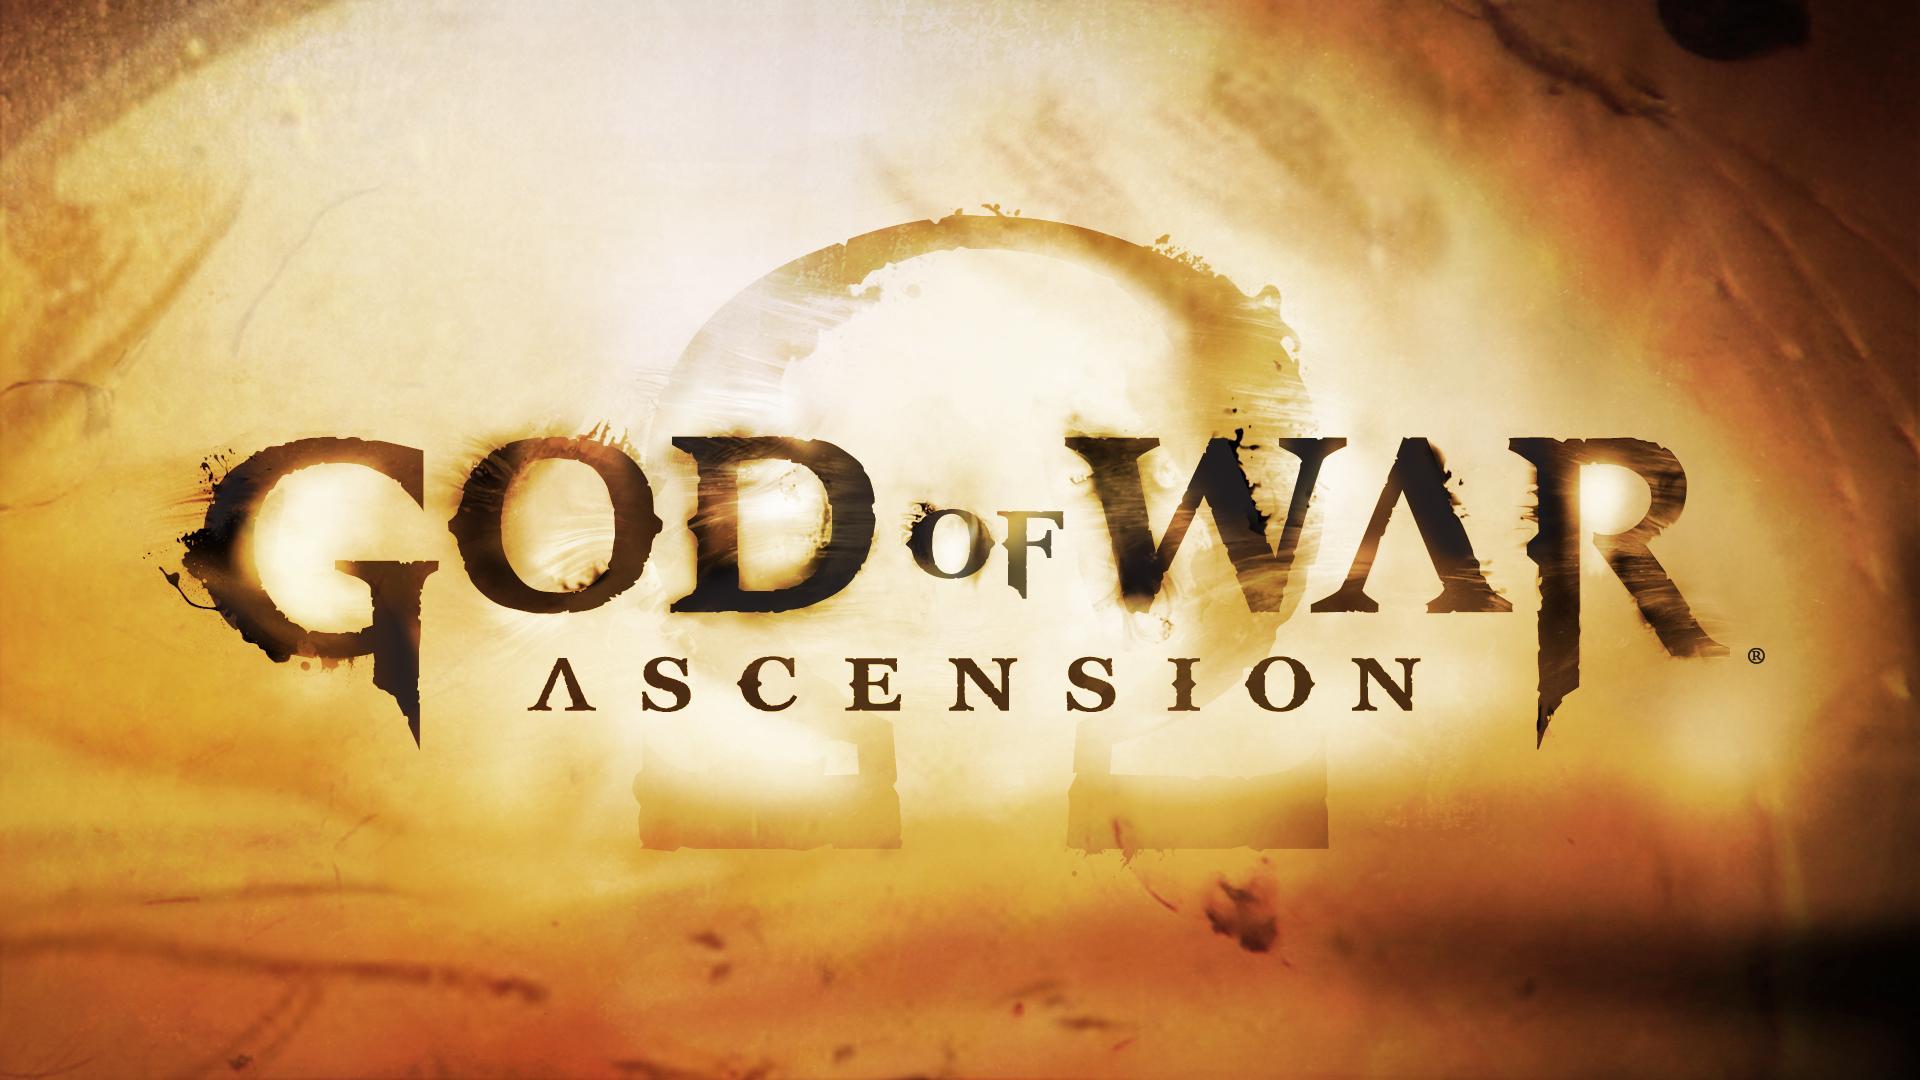 God of war ascension ps3 navi godofwarascensionlogo 1g voltagebd Gallery